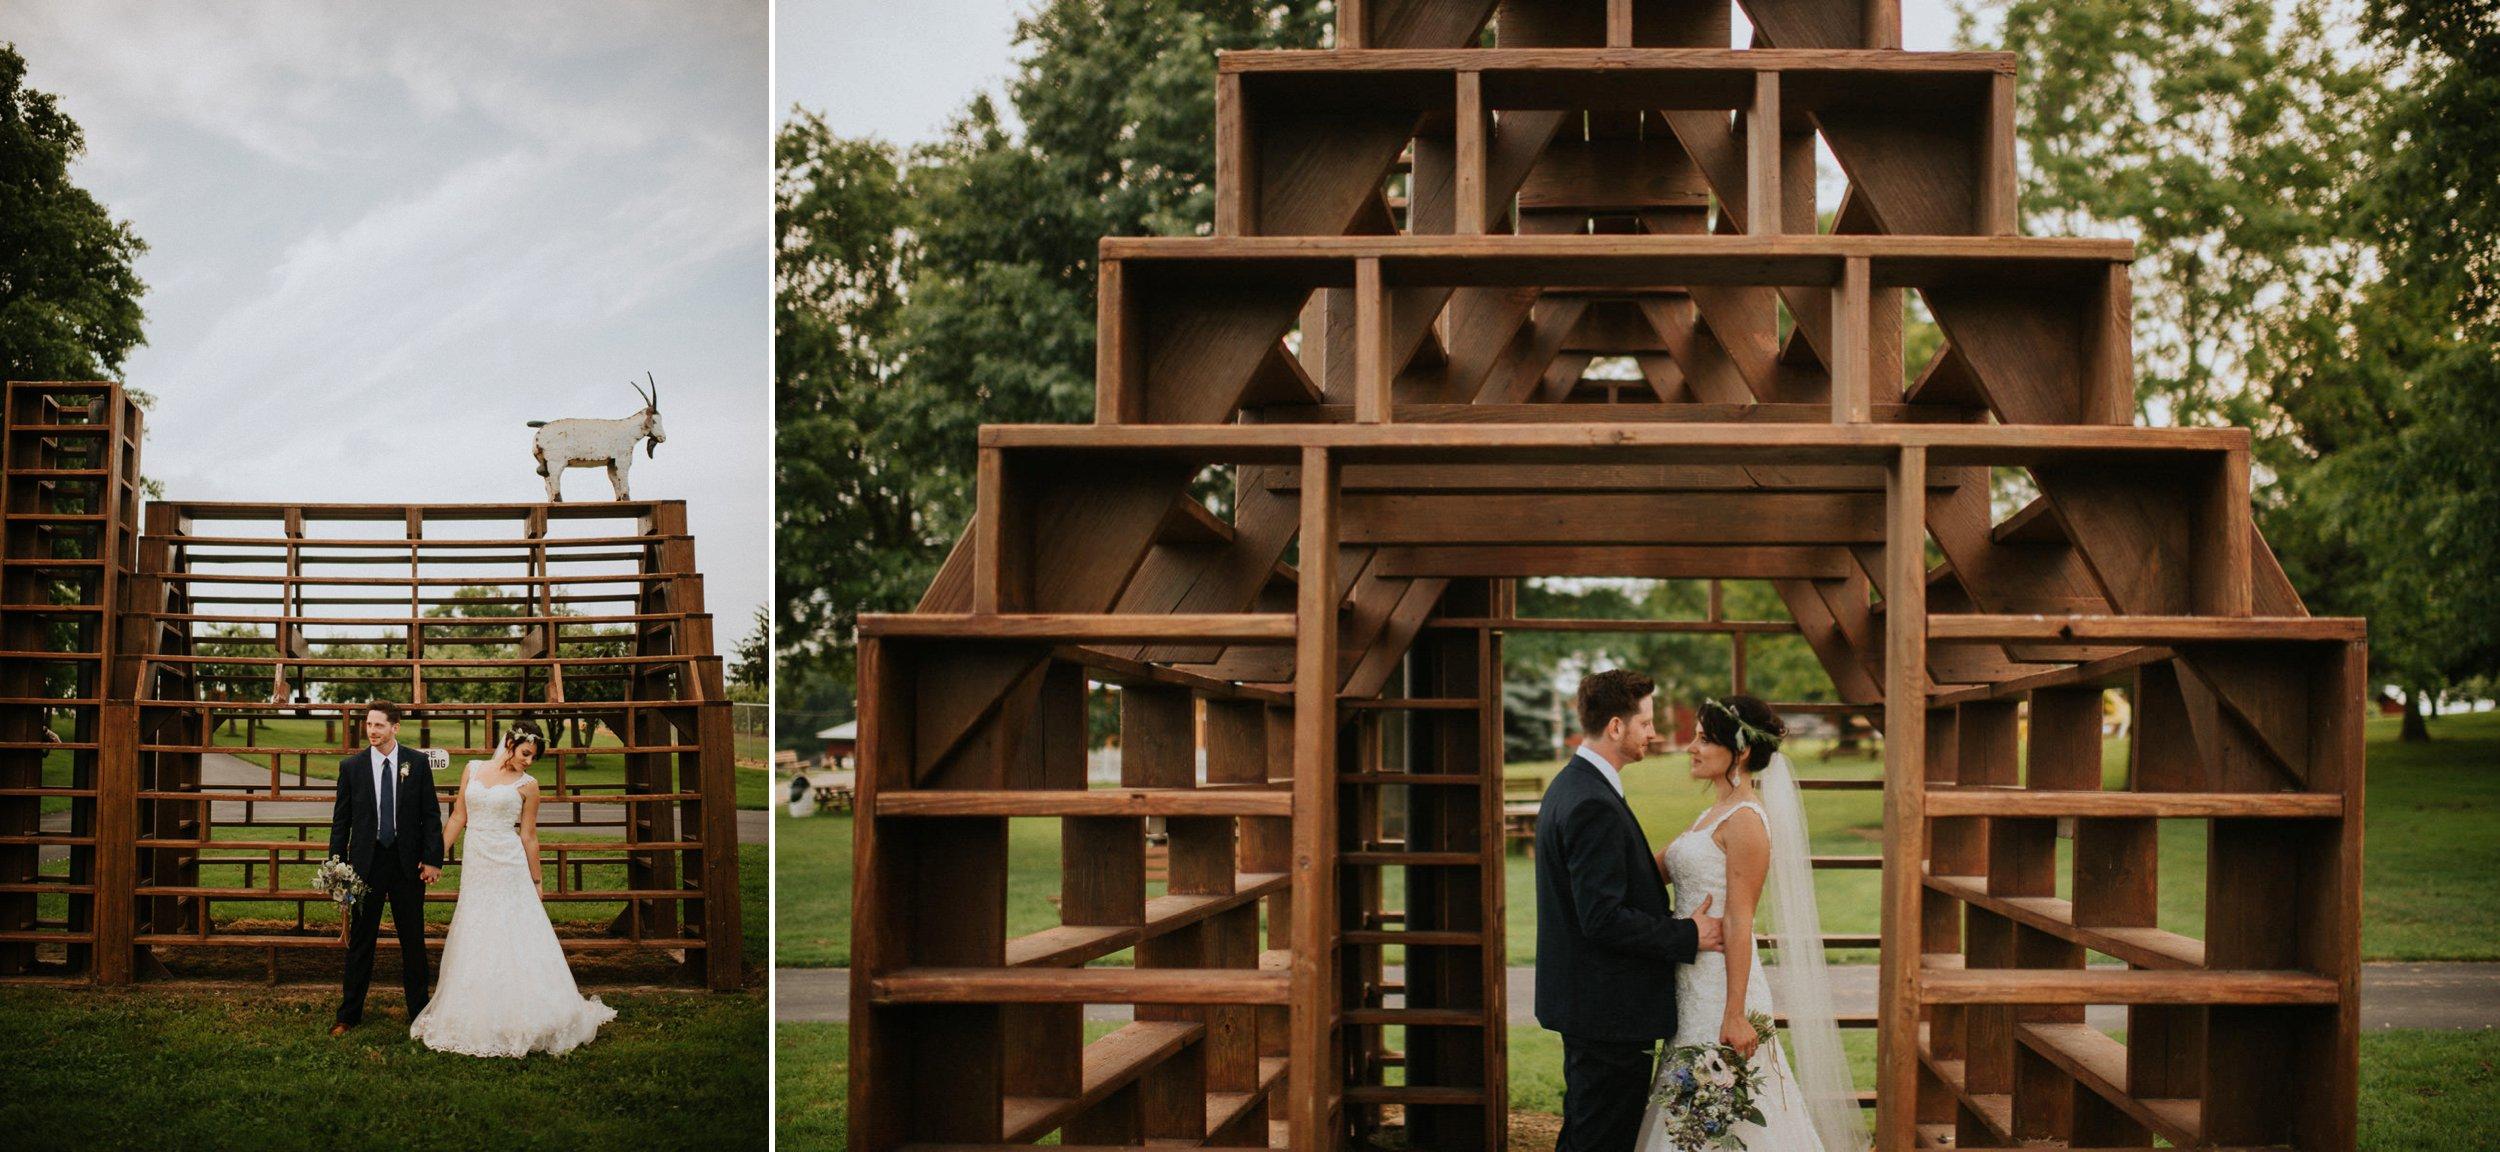 milburn_farms-wedding-82.jpg